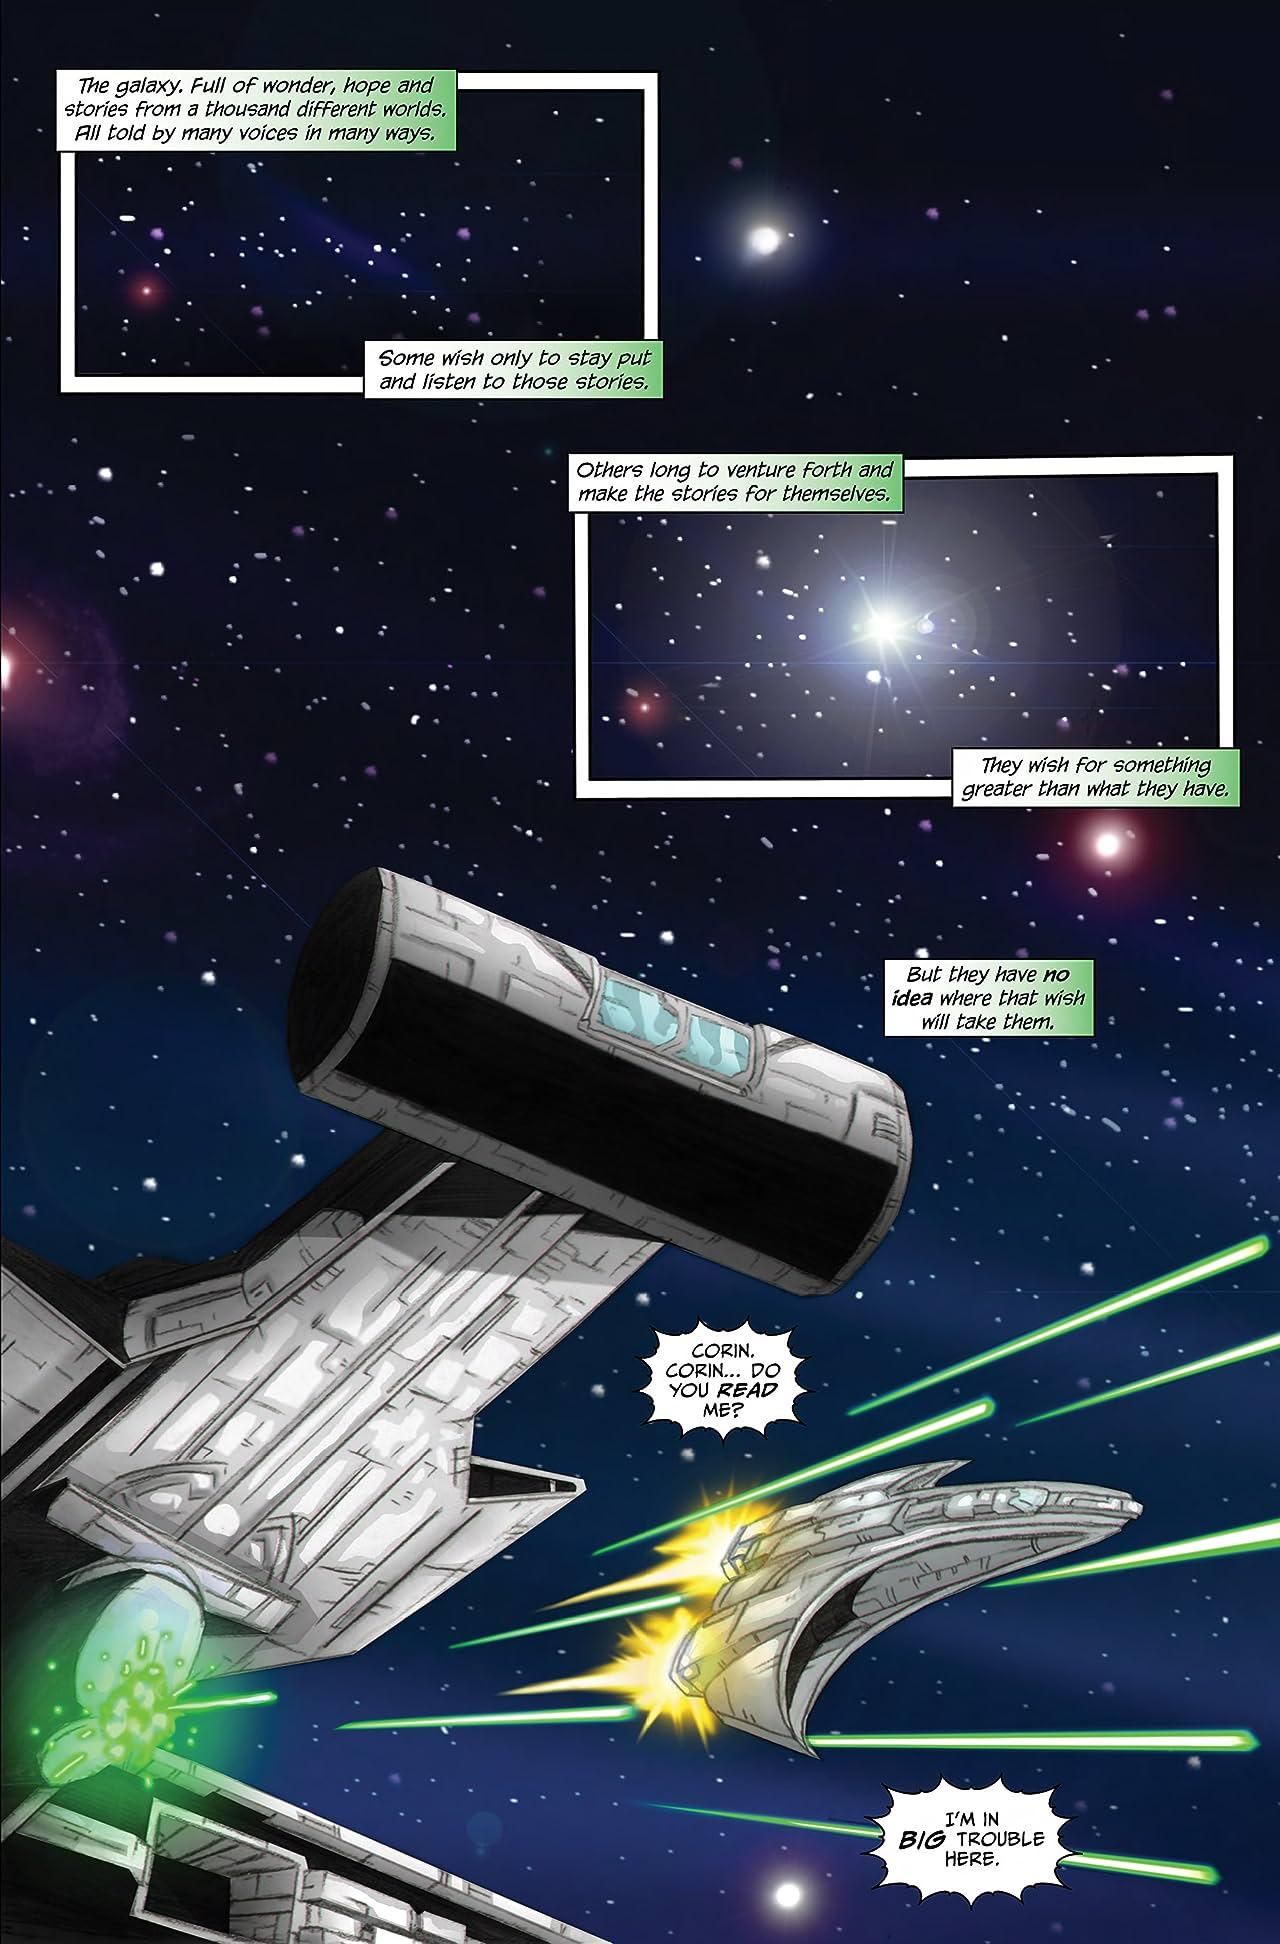 Roger Corman Presents: Battle Amongst the Stars #1